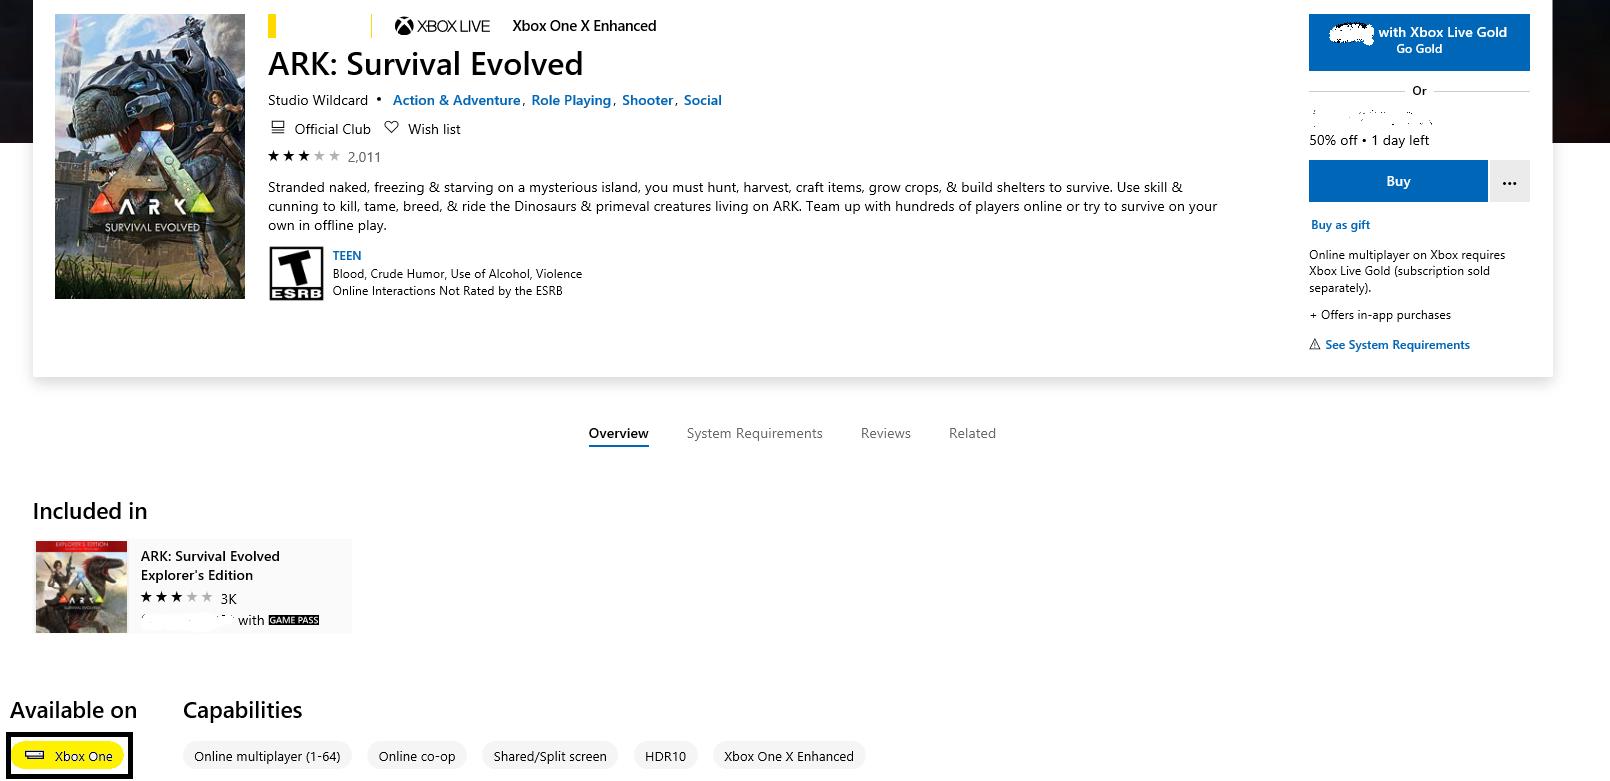 Ark Survival Evolved Windows 10 Version 3f3e8035-d45a-4794-8581-6ba2c23f8874?upload=true.png